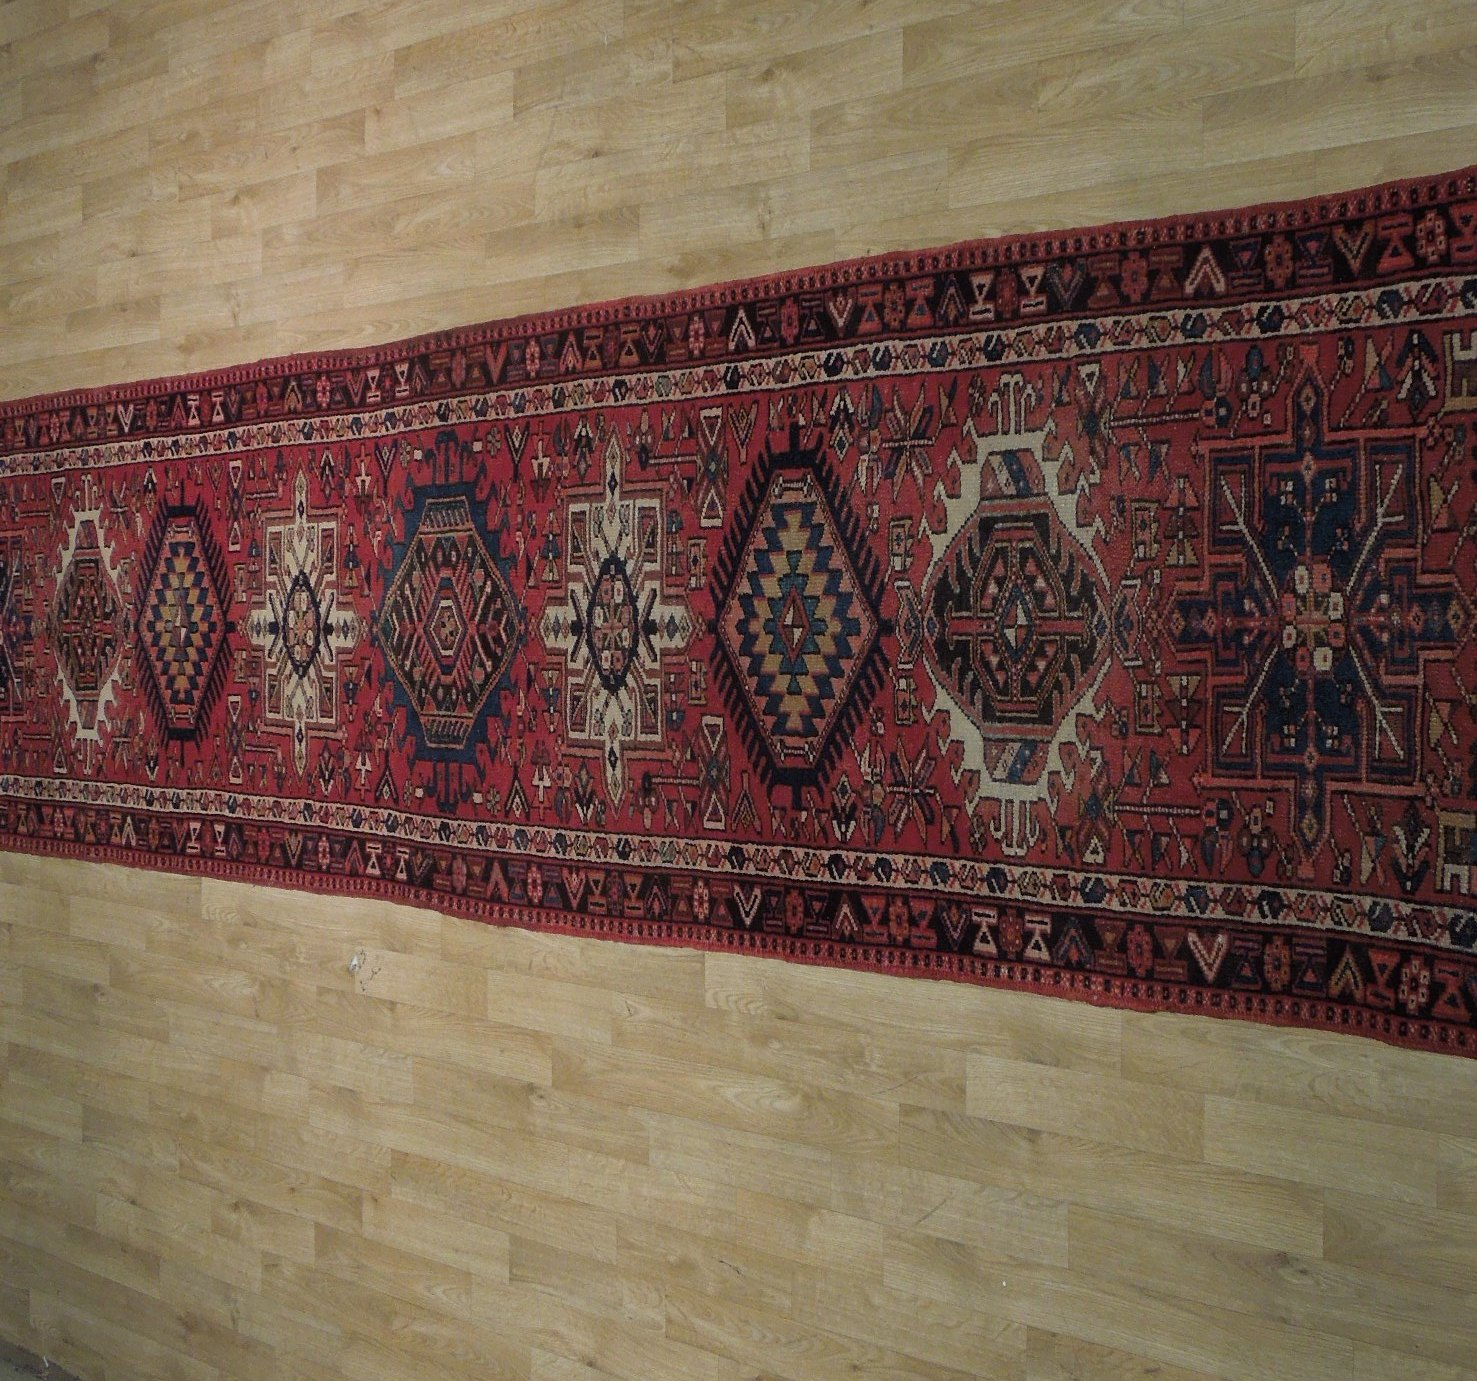 Red 3 x 13 All-Over Classic Tribal Design Runner Karaja Persian Handmade Rug image 10